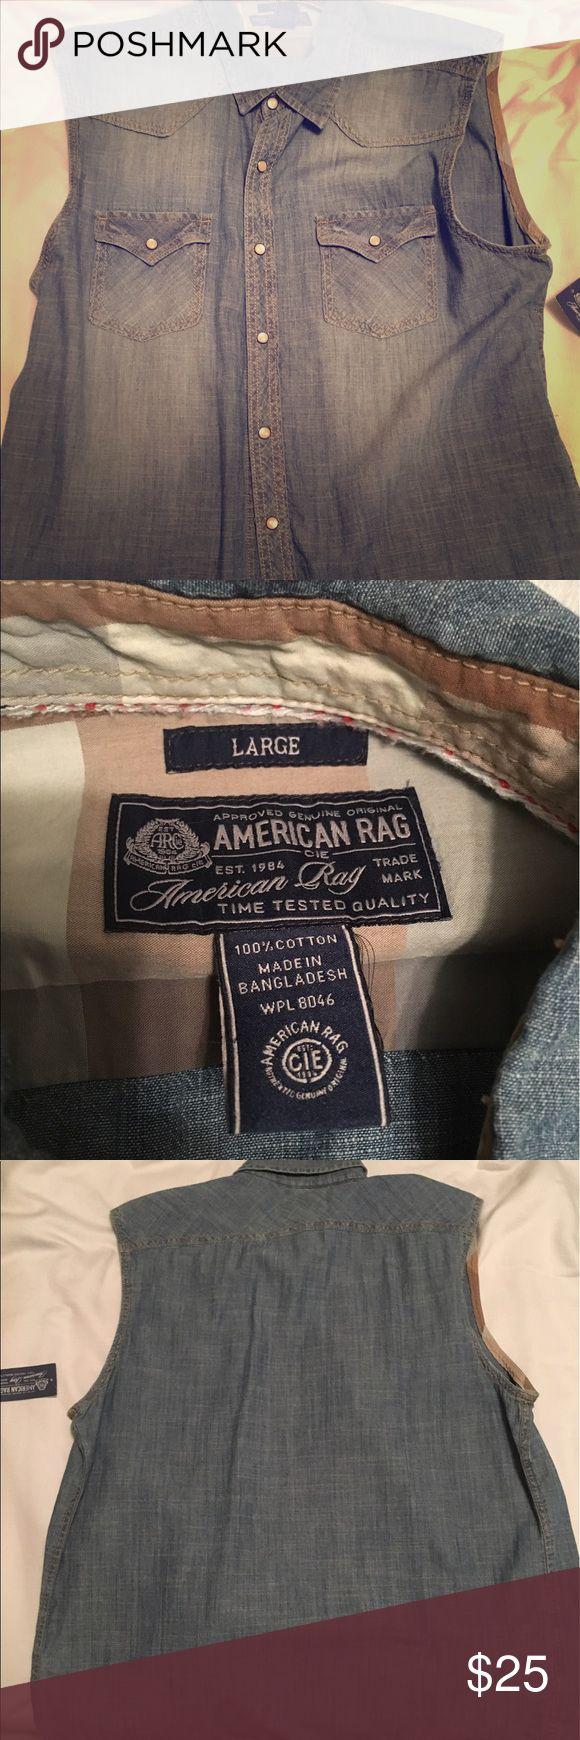 American Rag American Rag sleeveless jean shirt American Rag Shirts